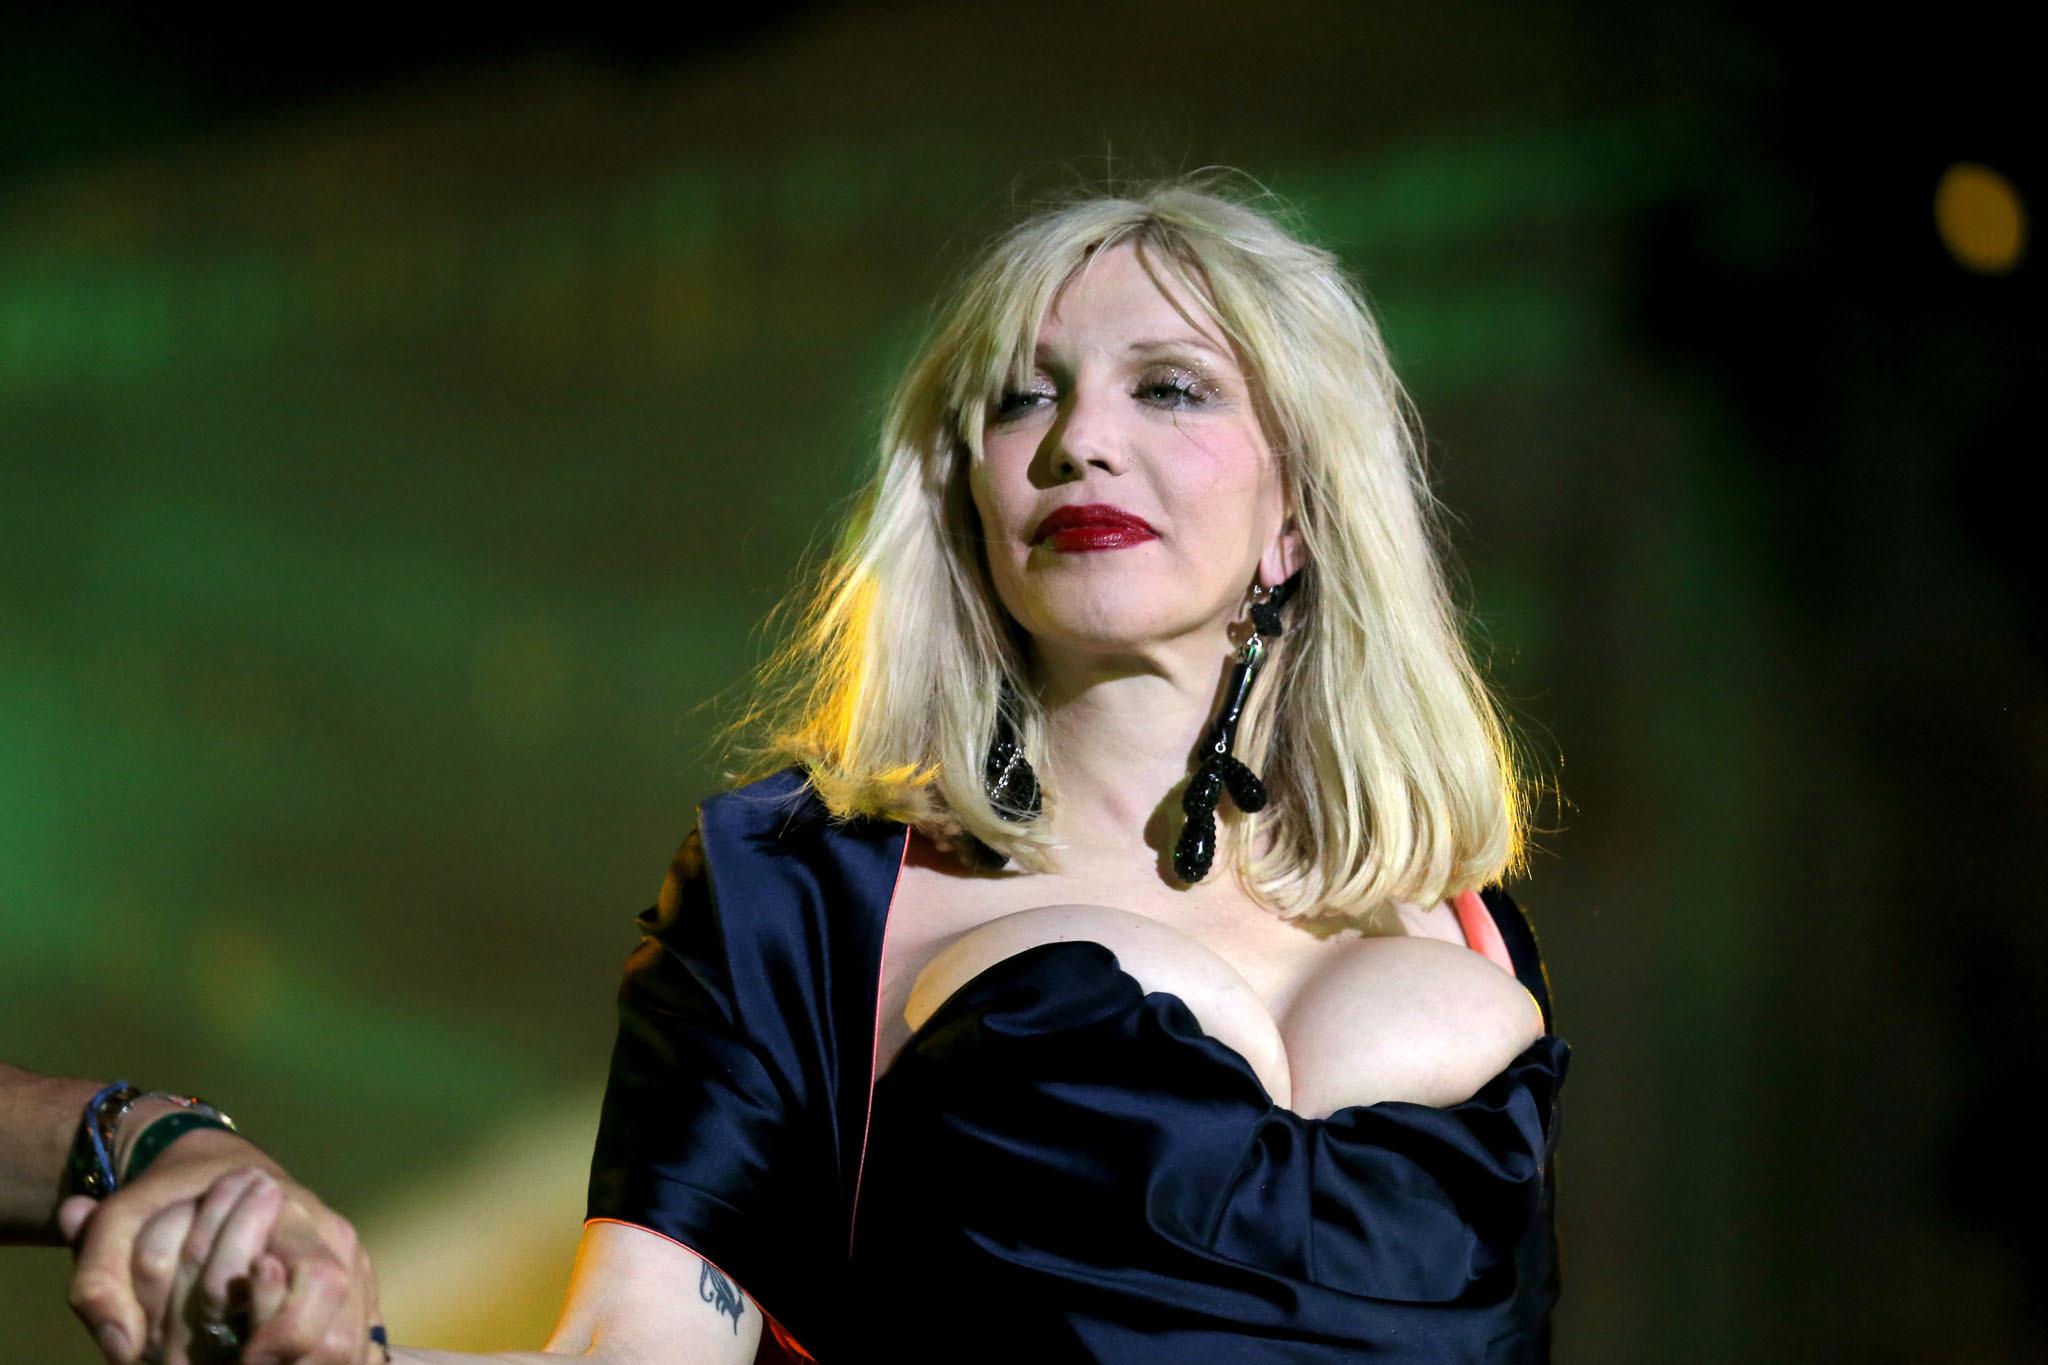 Courtney Love Widescreen